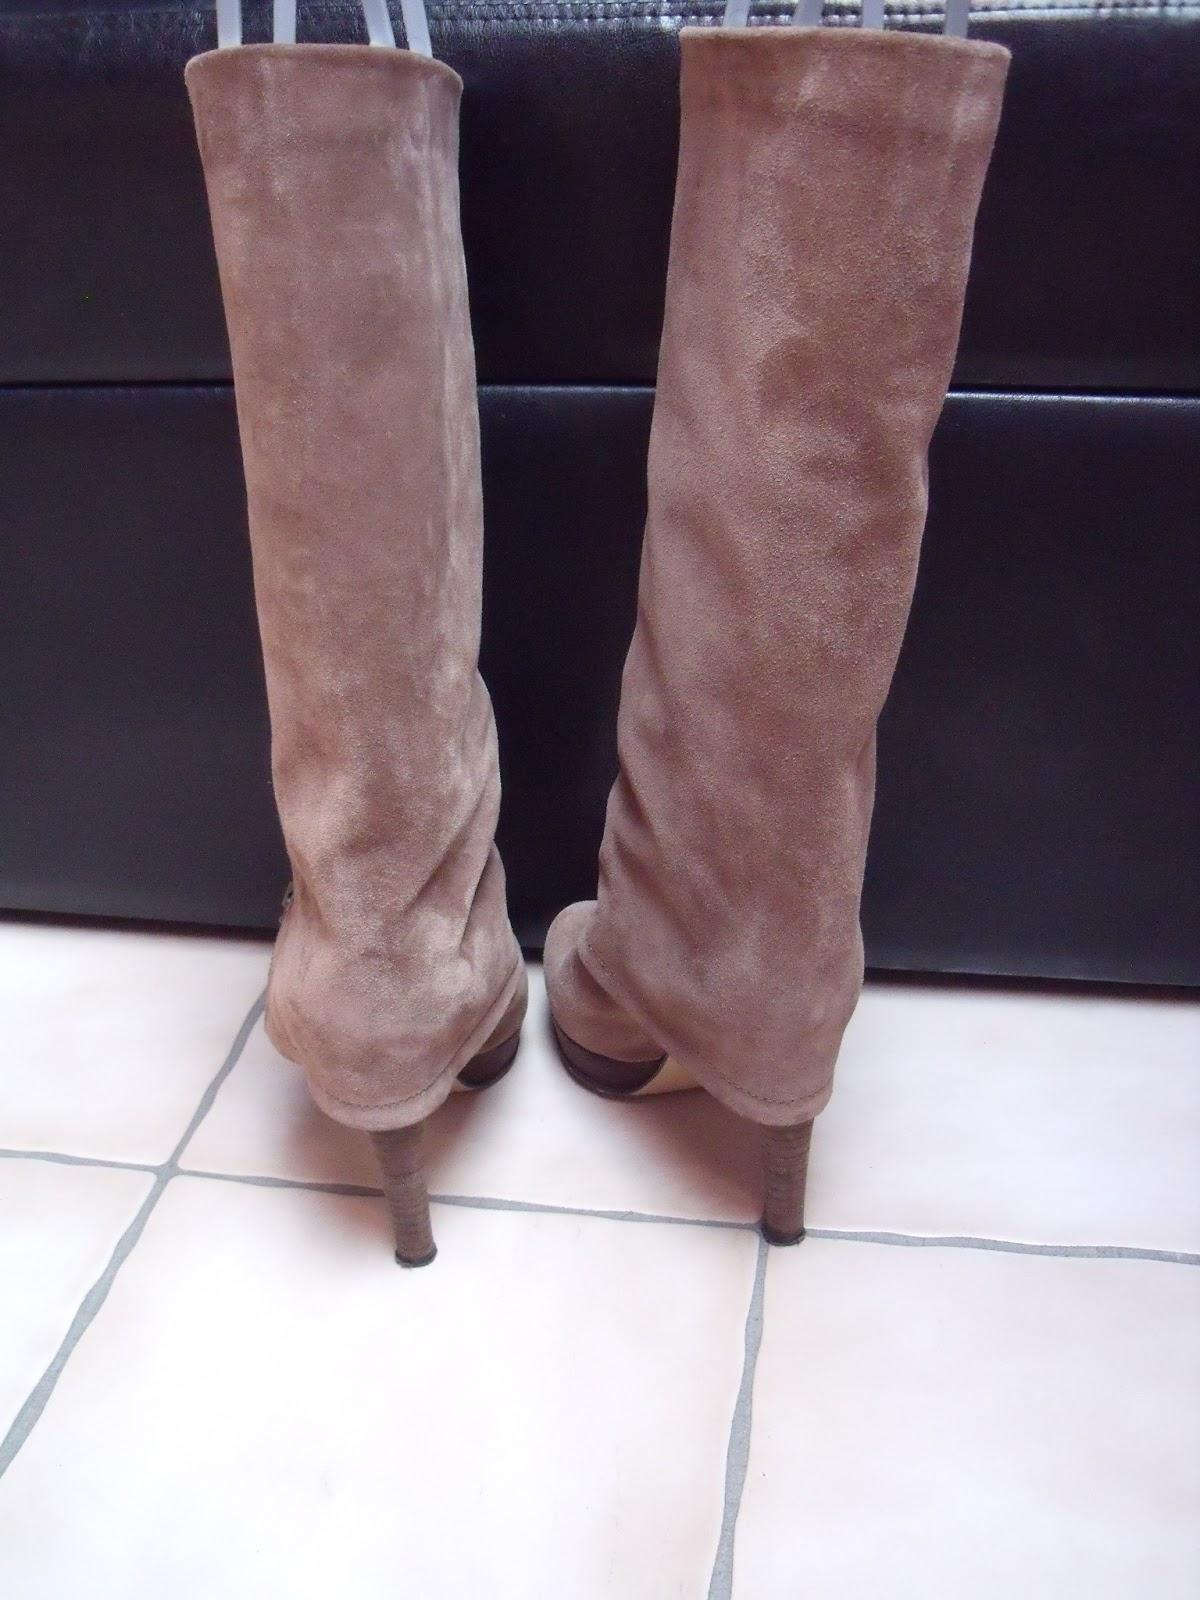 magasin d'usine 3e72a 084dd VIMODA eBay store: Bottes italiennes en daim beige/brun clair 37